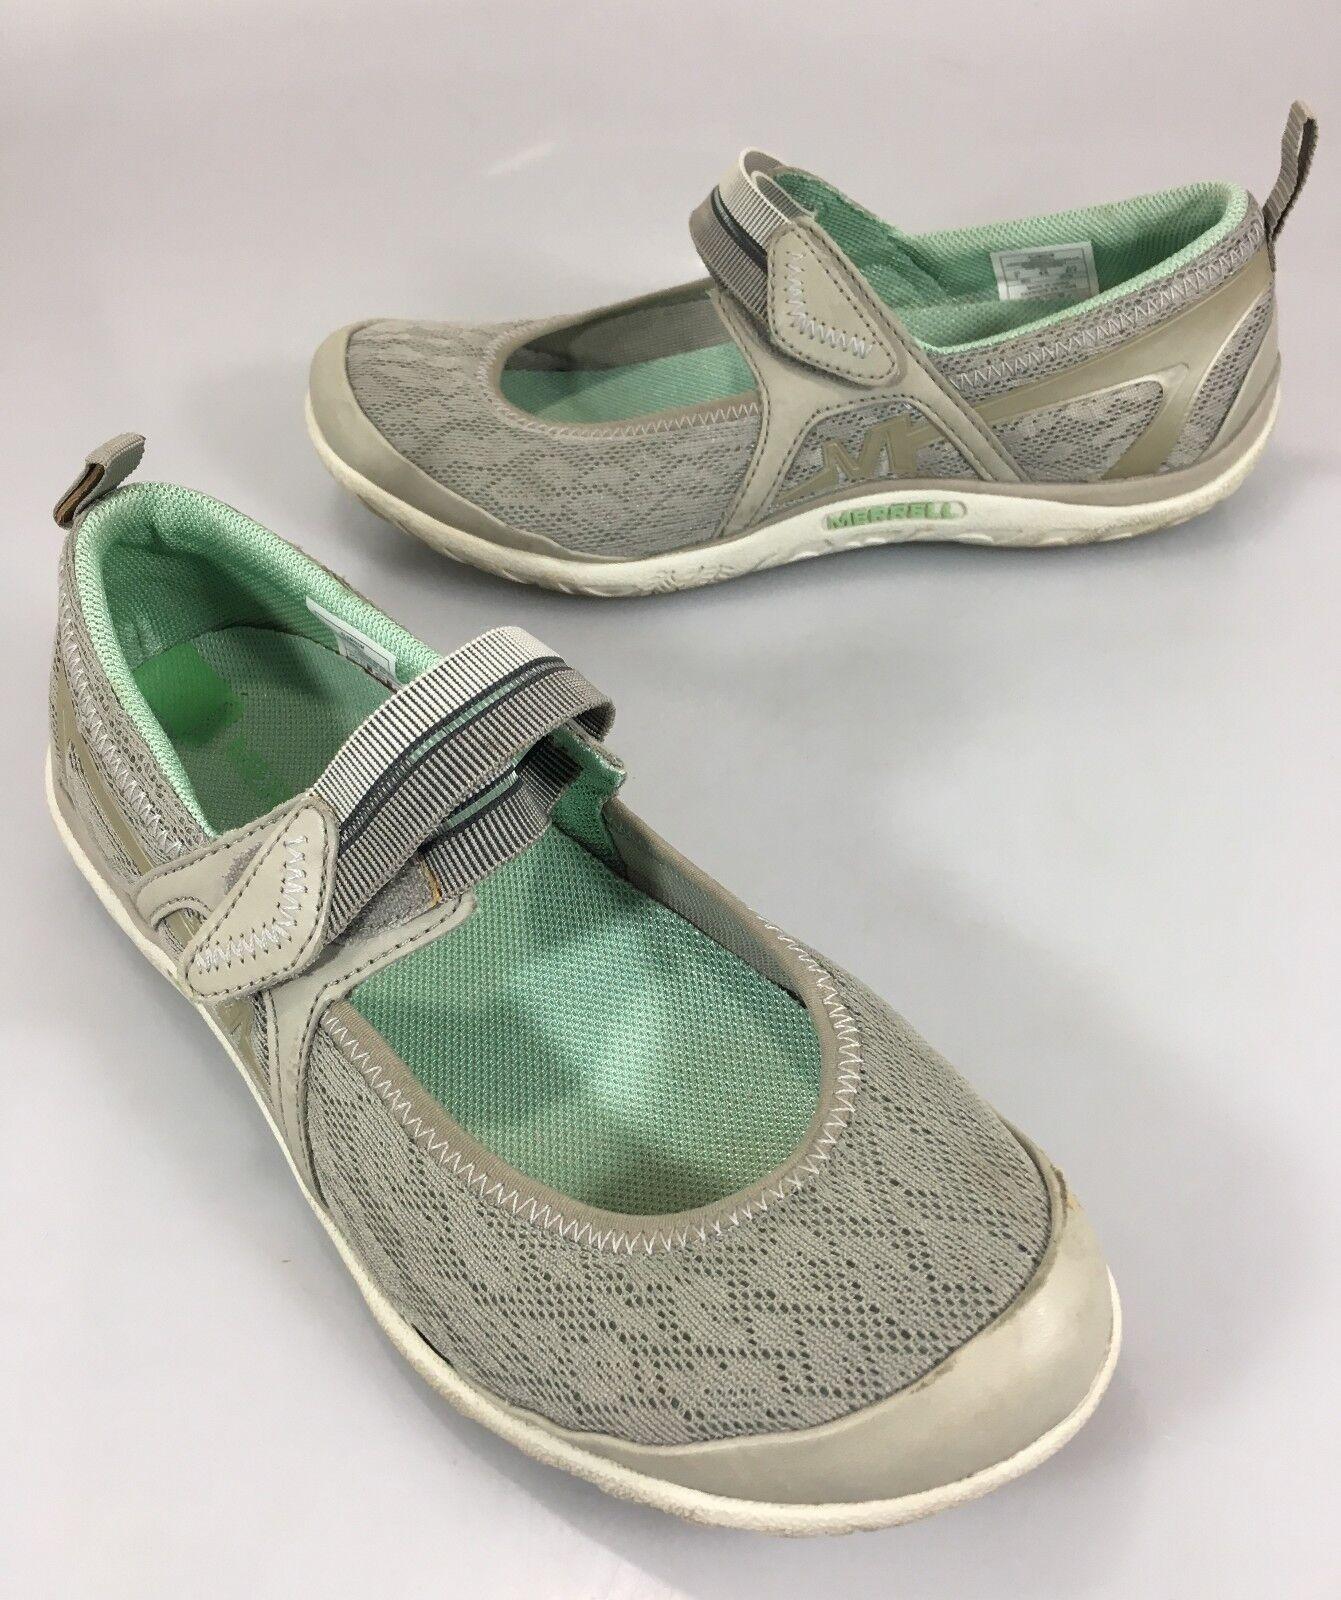 Merrell Women 7 Aluminum Enlighten Eluma Breeze Mary Jane Mesh Shoes Sneakers